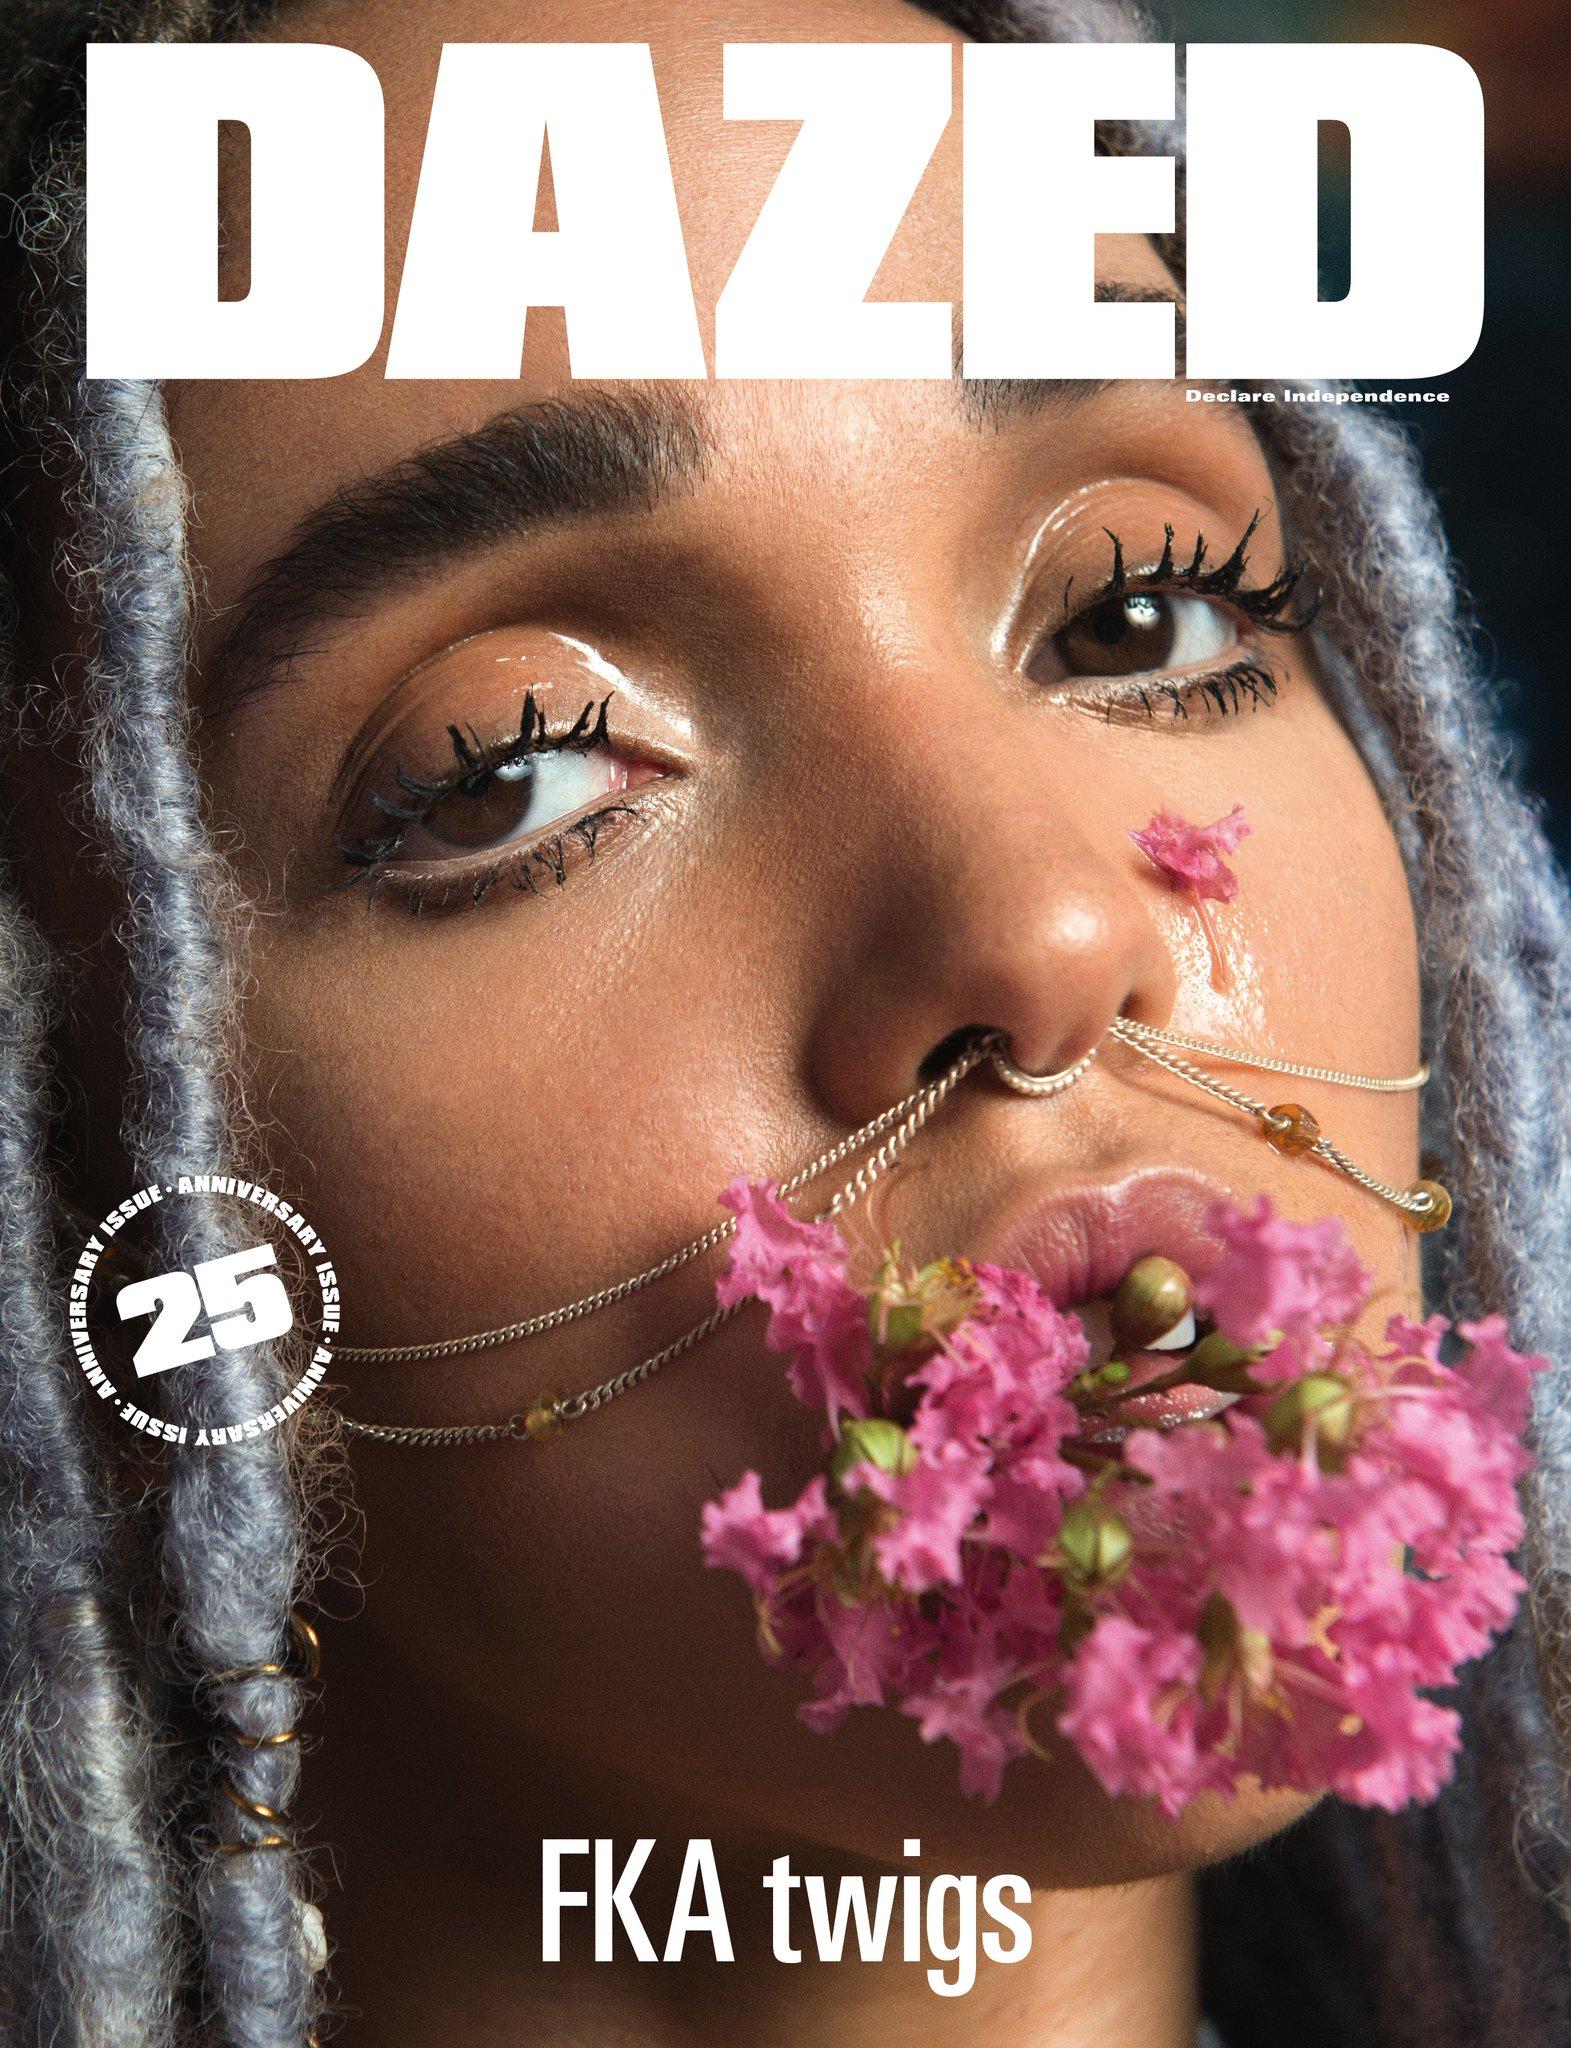 "<a href=""http://www.dazeddigital.com/artsandculture/article/32982/1/the-25th-anniversary-issue"" Target=""_Blank"">DAZED & CONFUSED</a>"